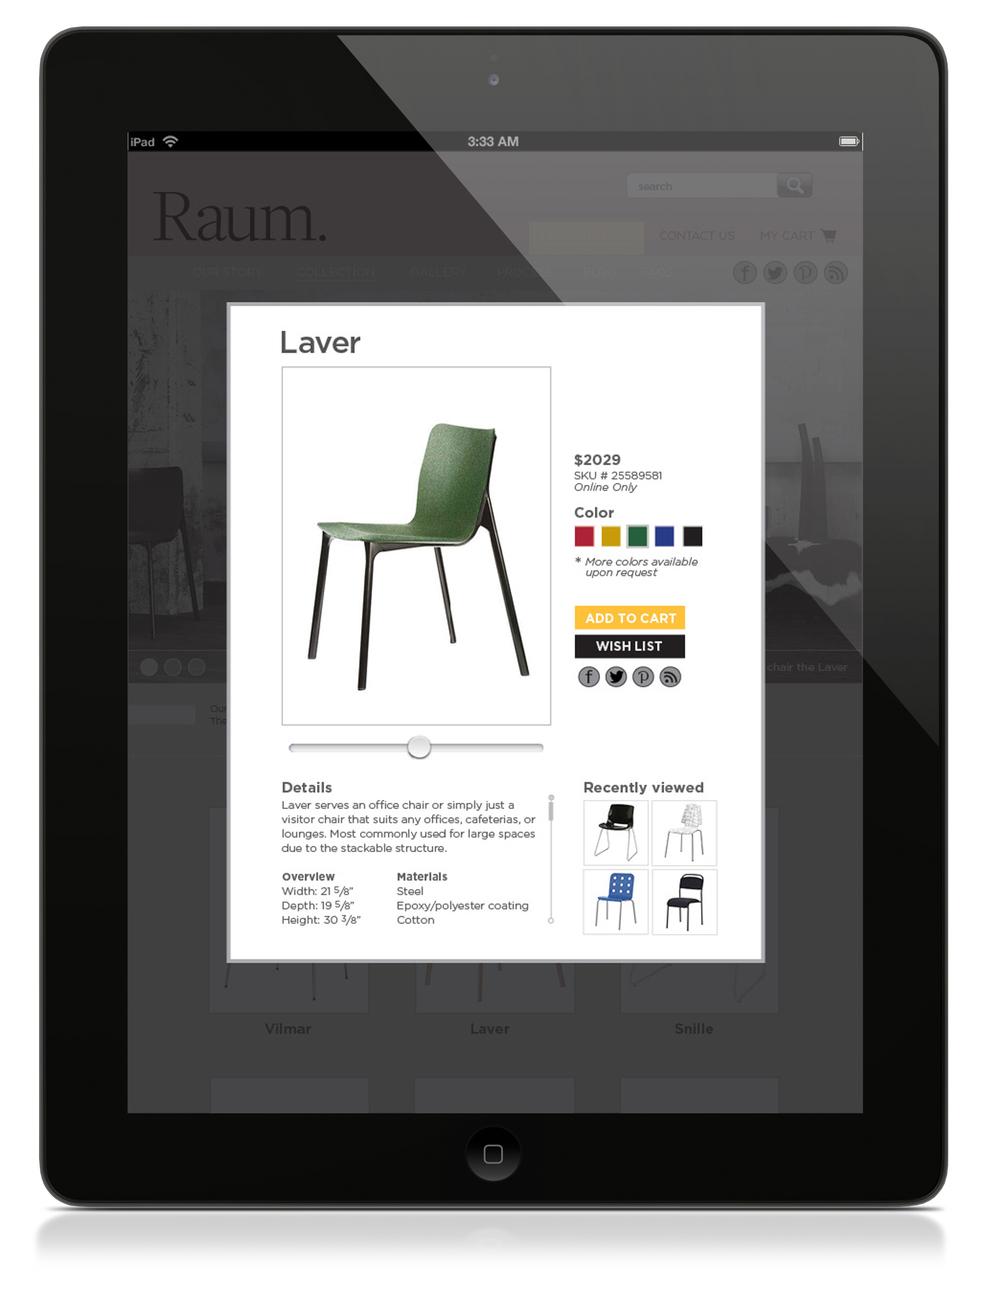 ipad_raum5.jpg